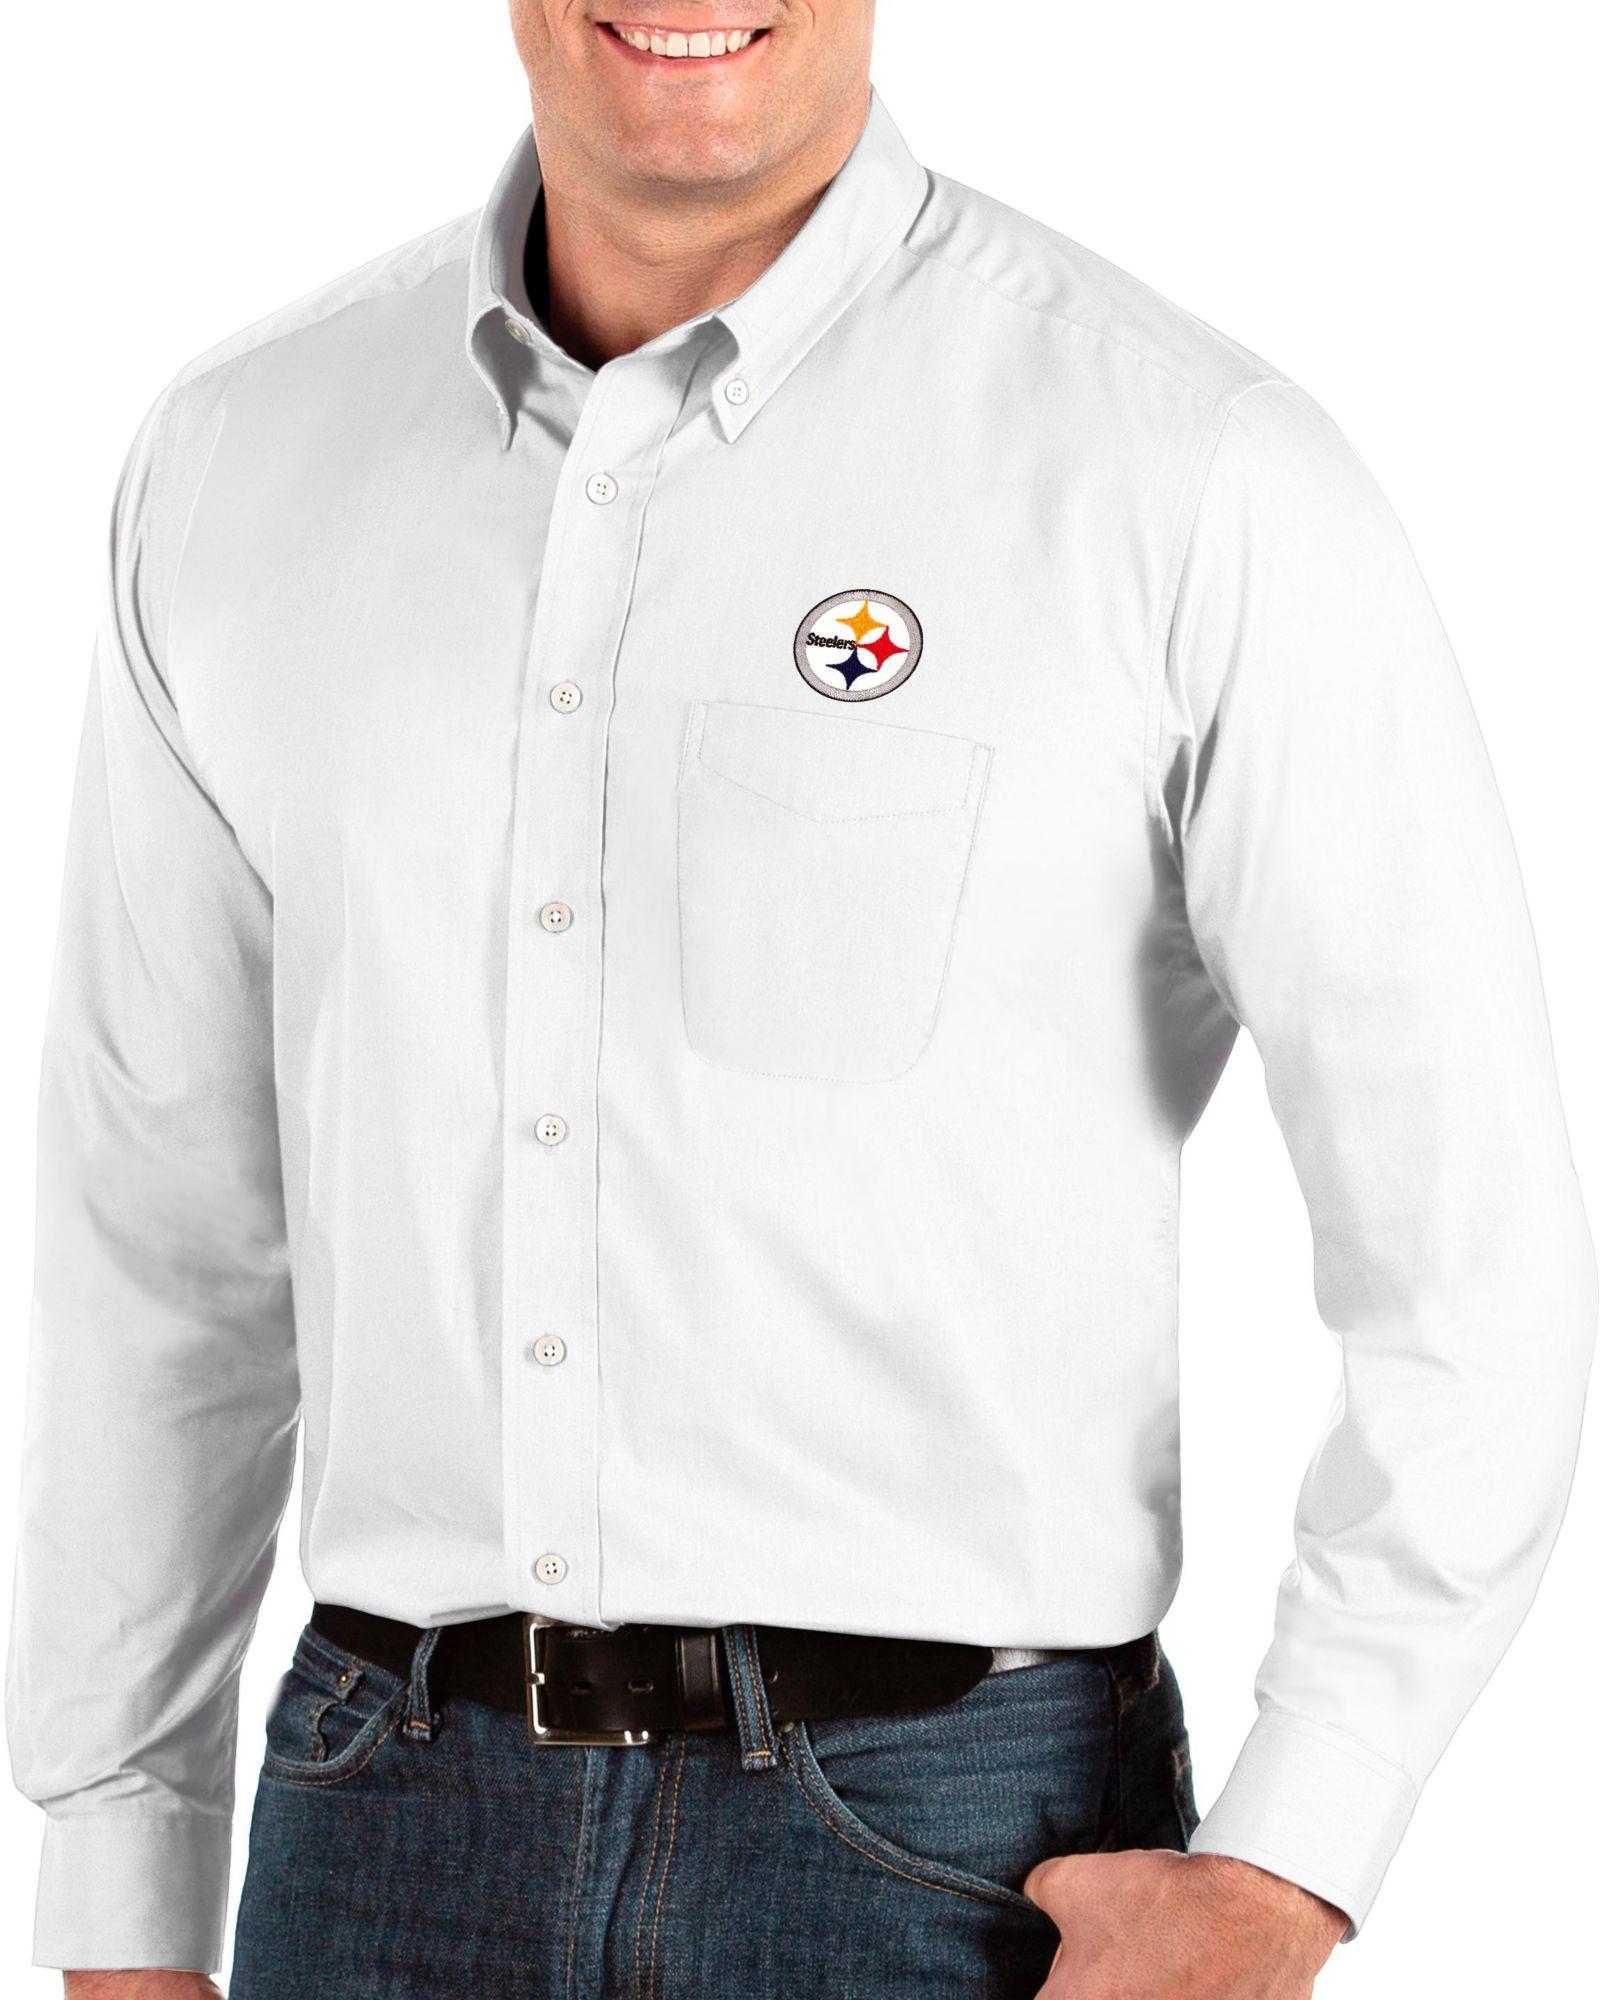 pittsburgh steelers dress shirt